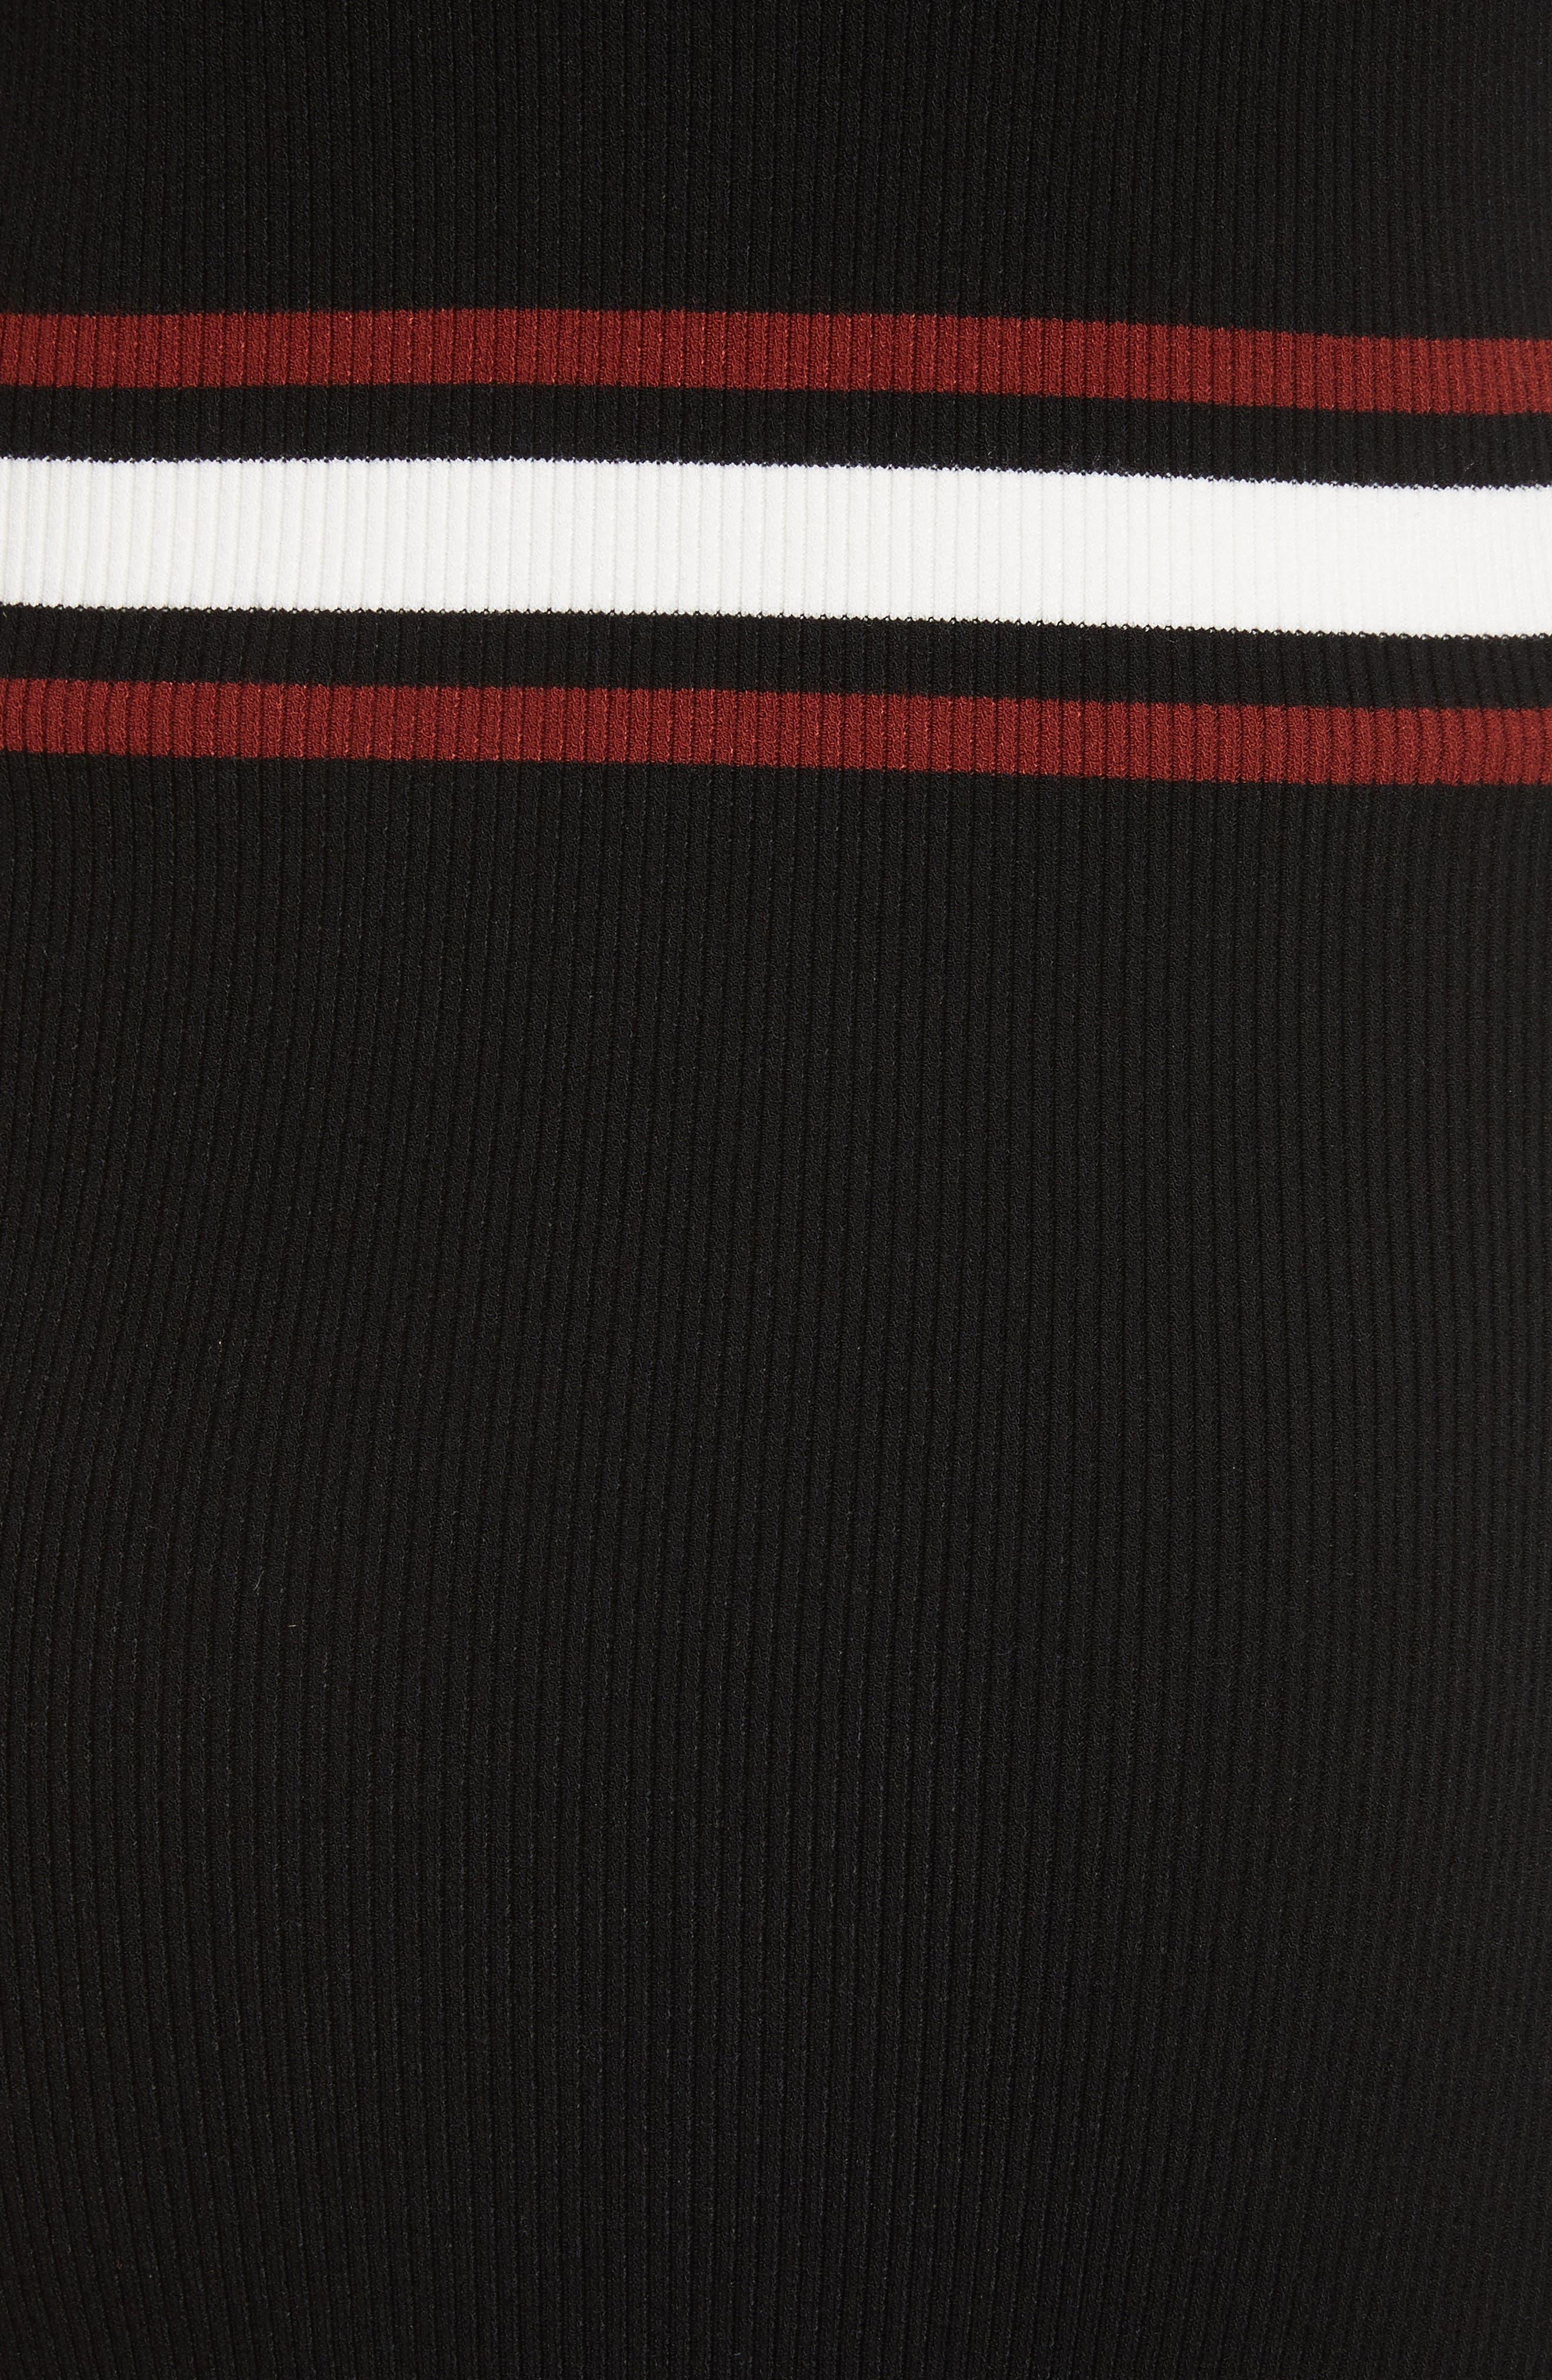 Anders Rib Knit Dress,                             Alternate thumbnail 5, color,                             002